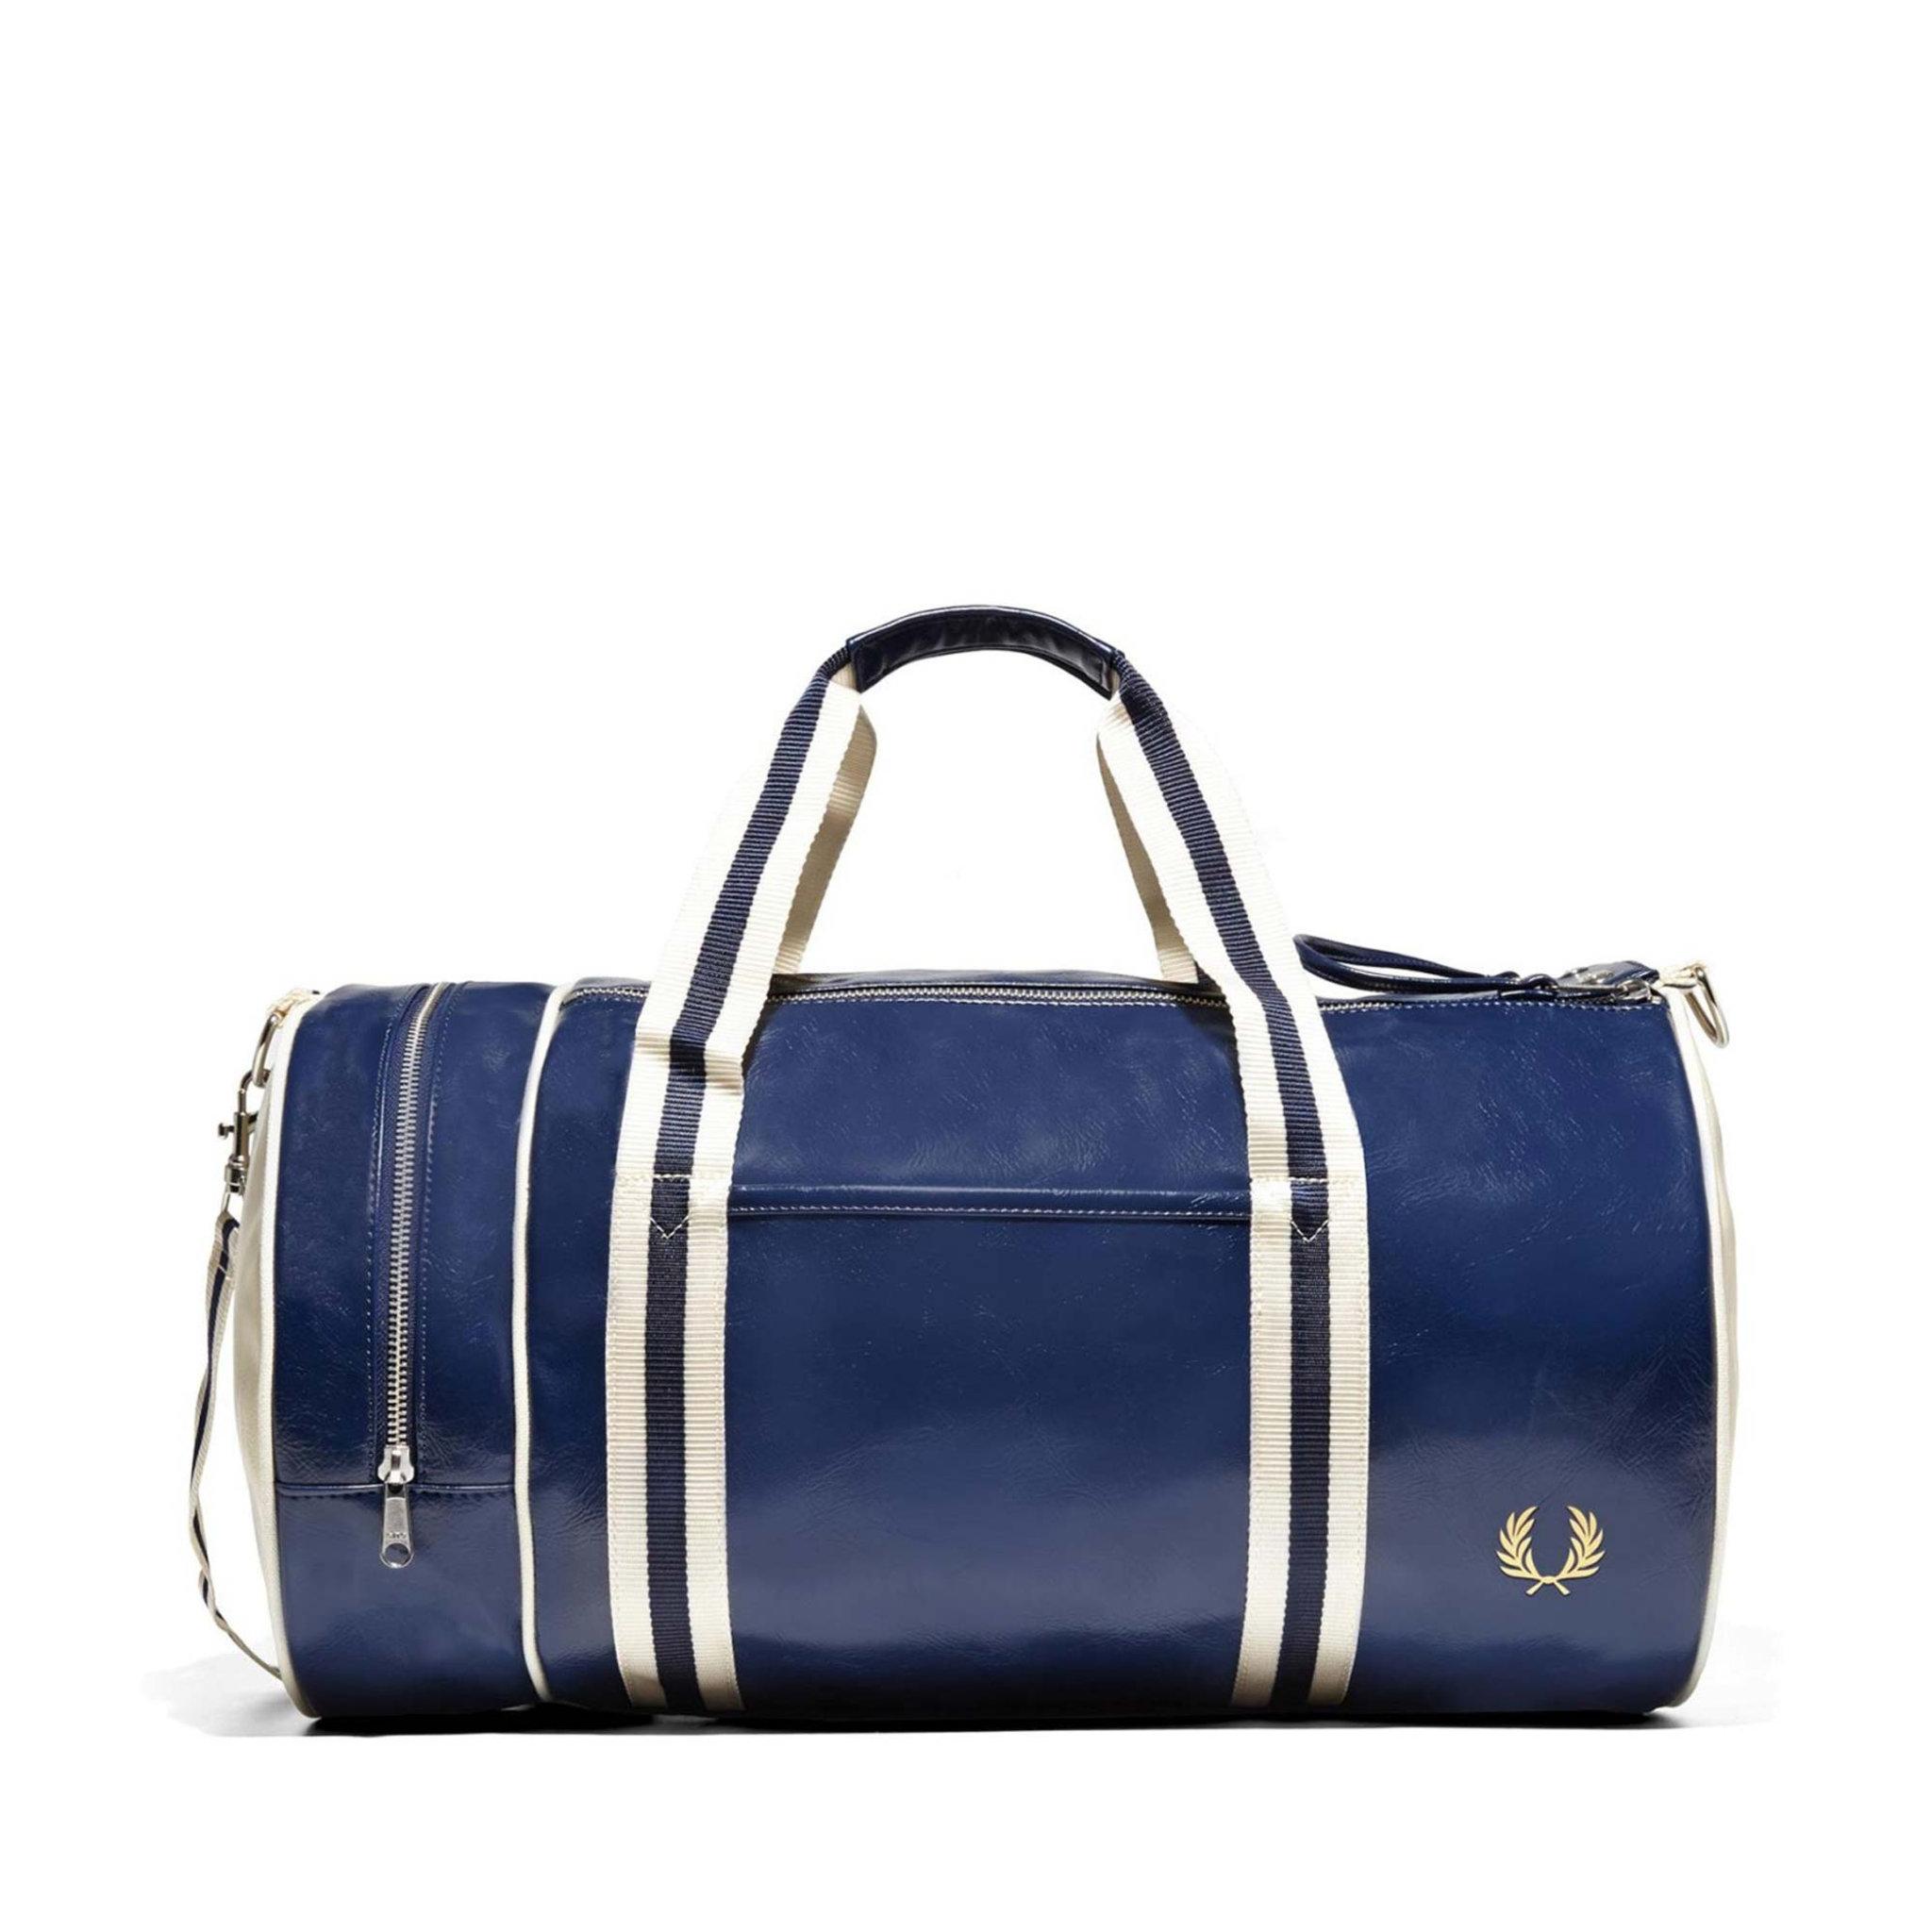 Classic Barrel Bag Väskor & plånböcker Köp online på